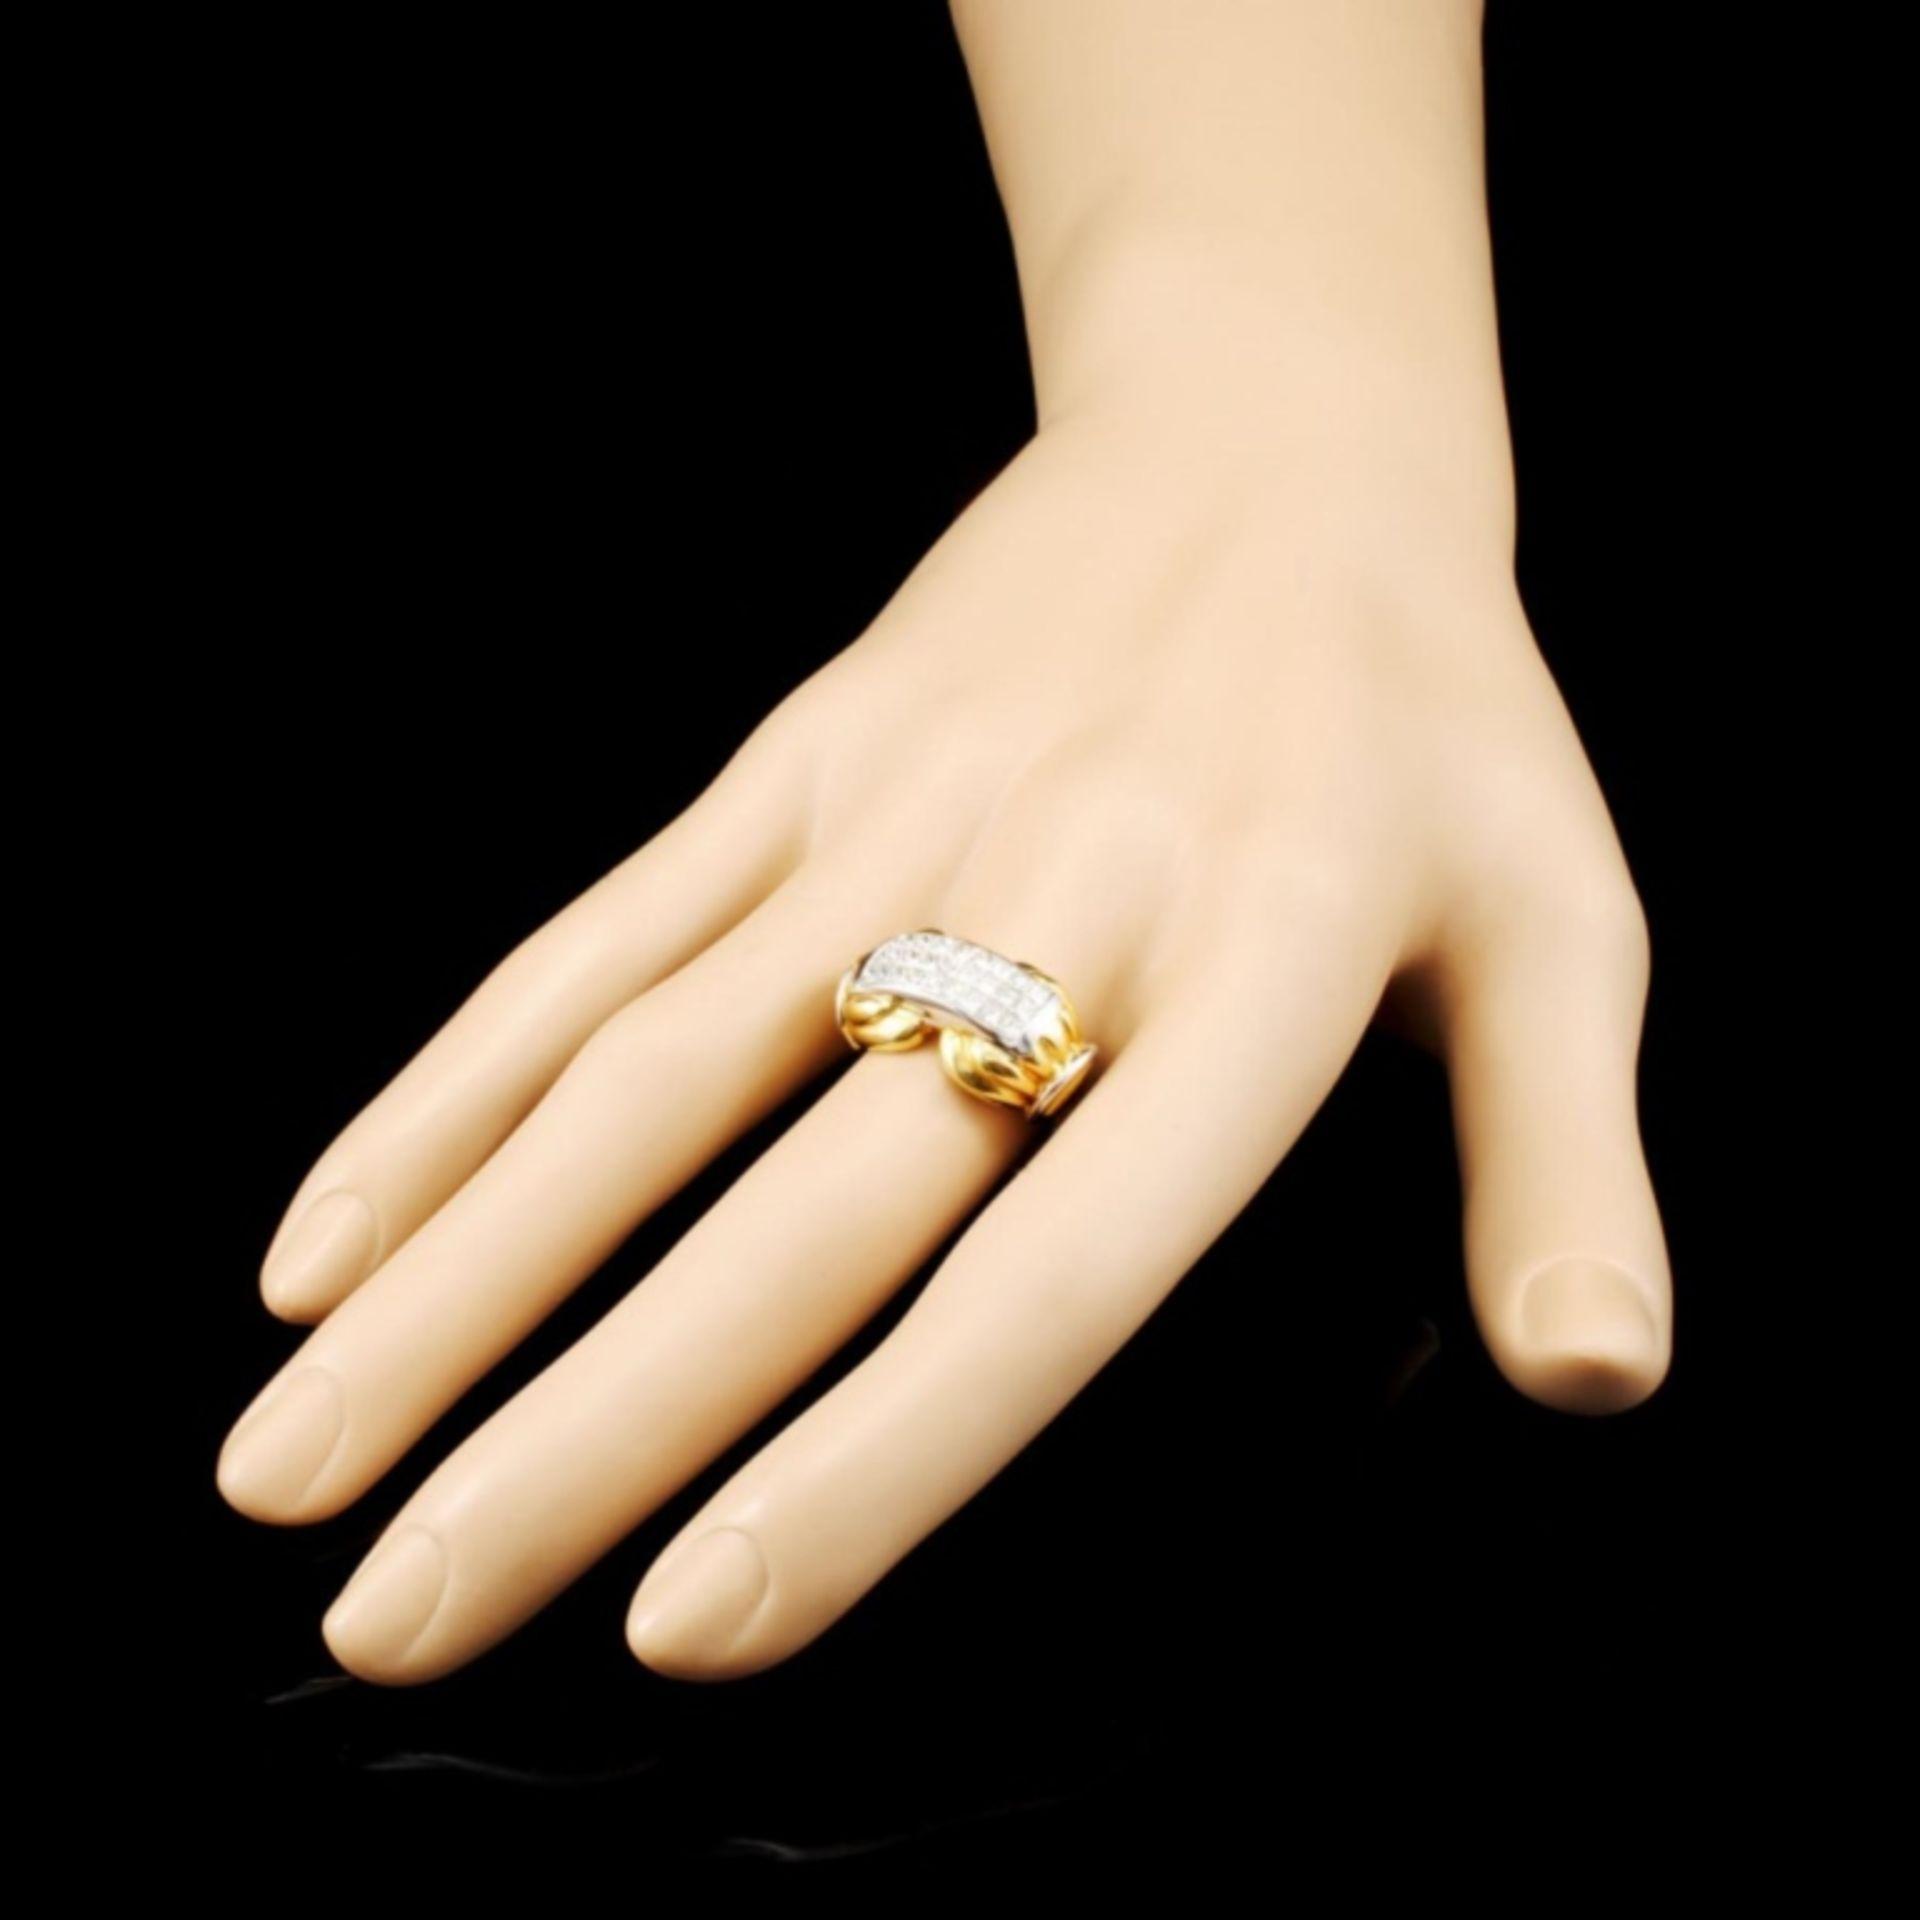 18K Gold 1.29ctw Diamond Ring - Image 3 of 4